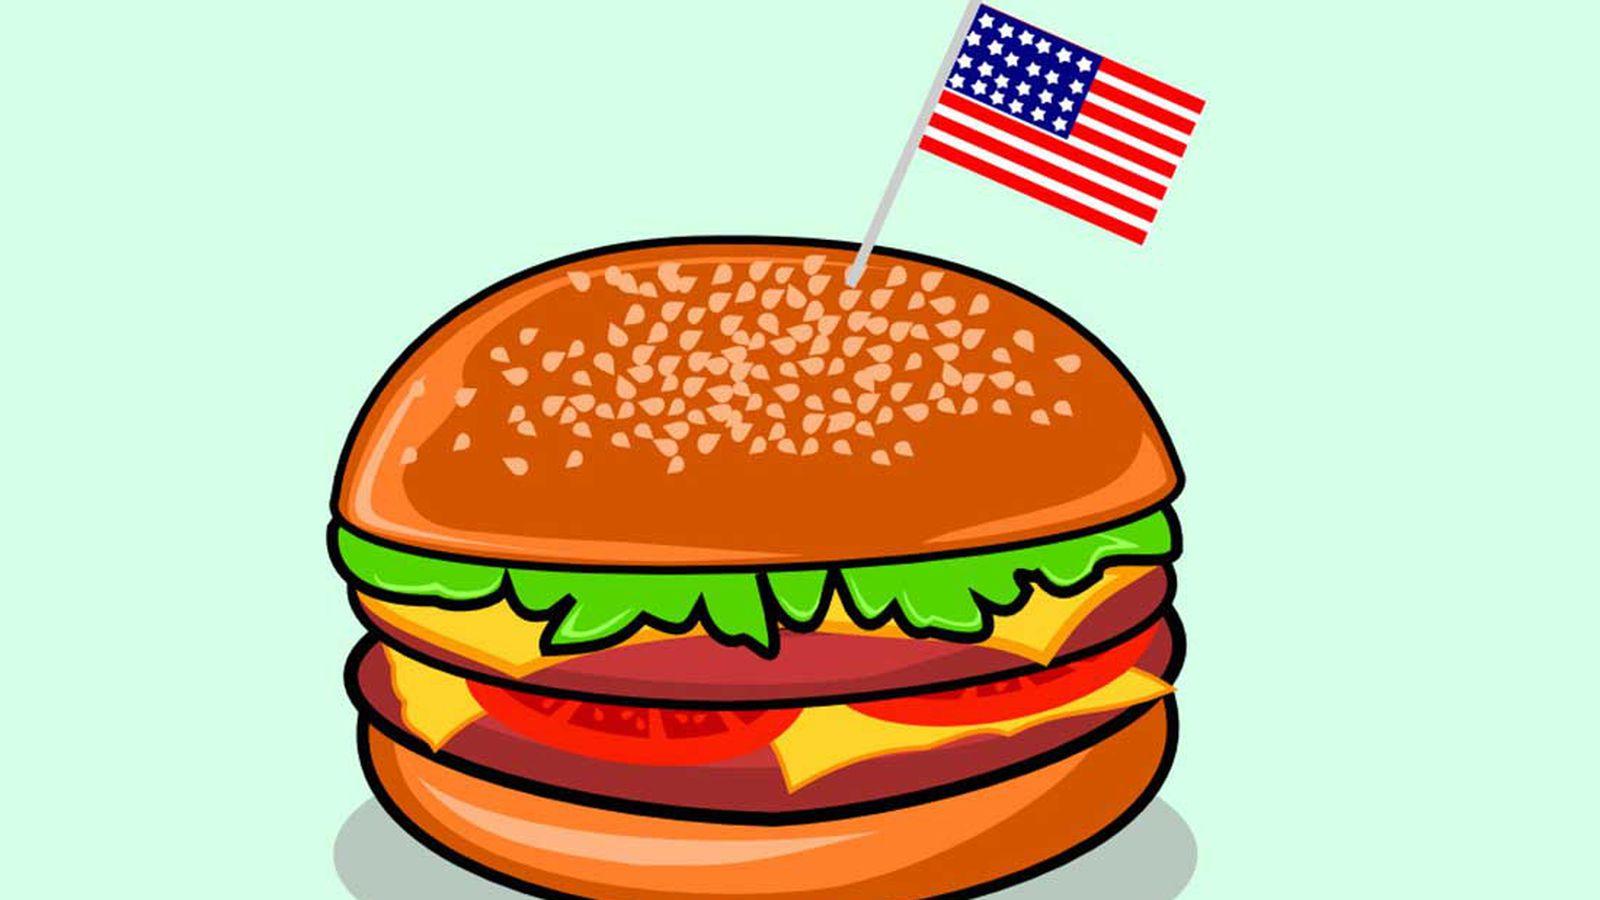 Hamburger clipart american burger. The average price of